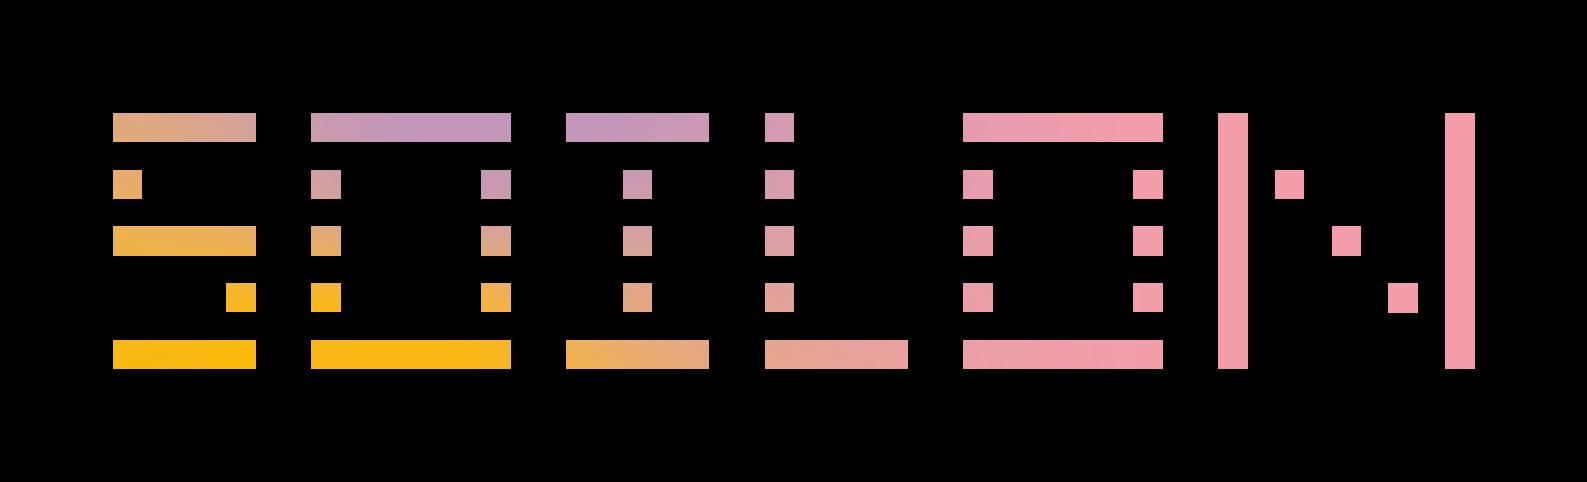 LAY09_Soilon_Logo_Verlauf_01